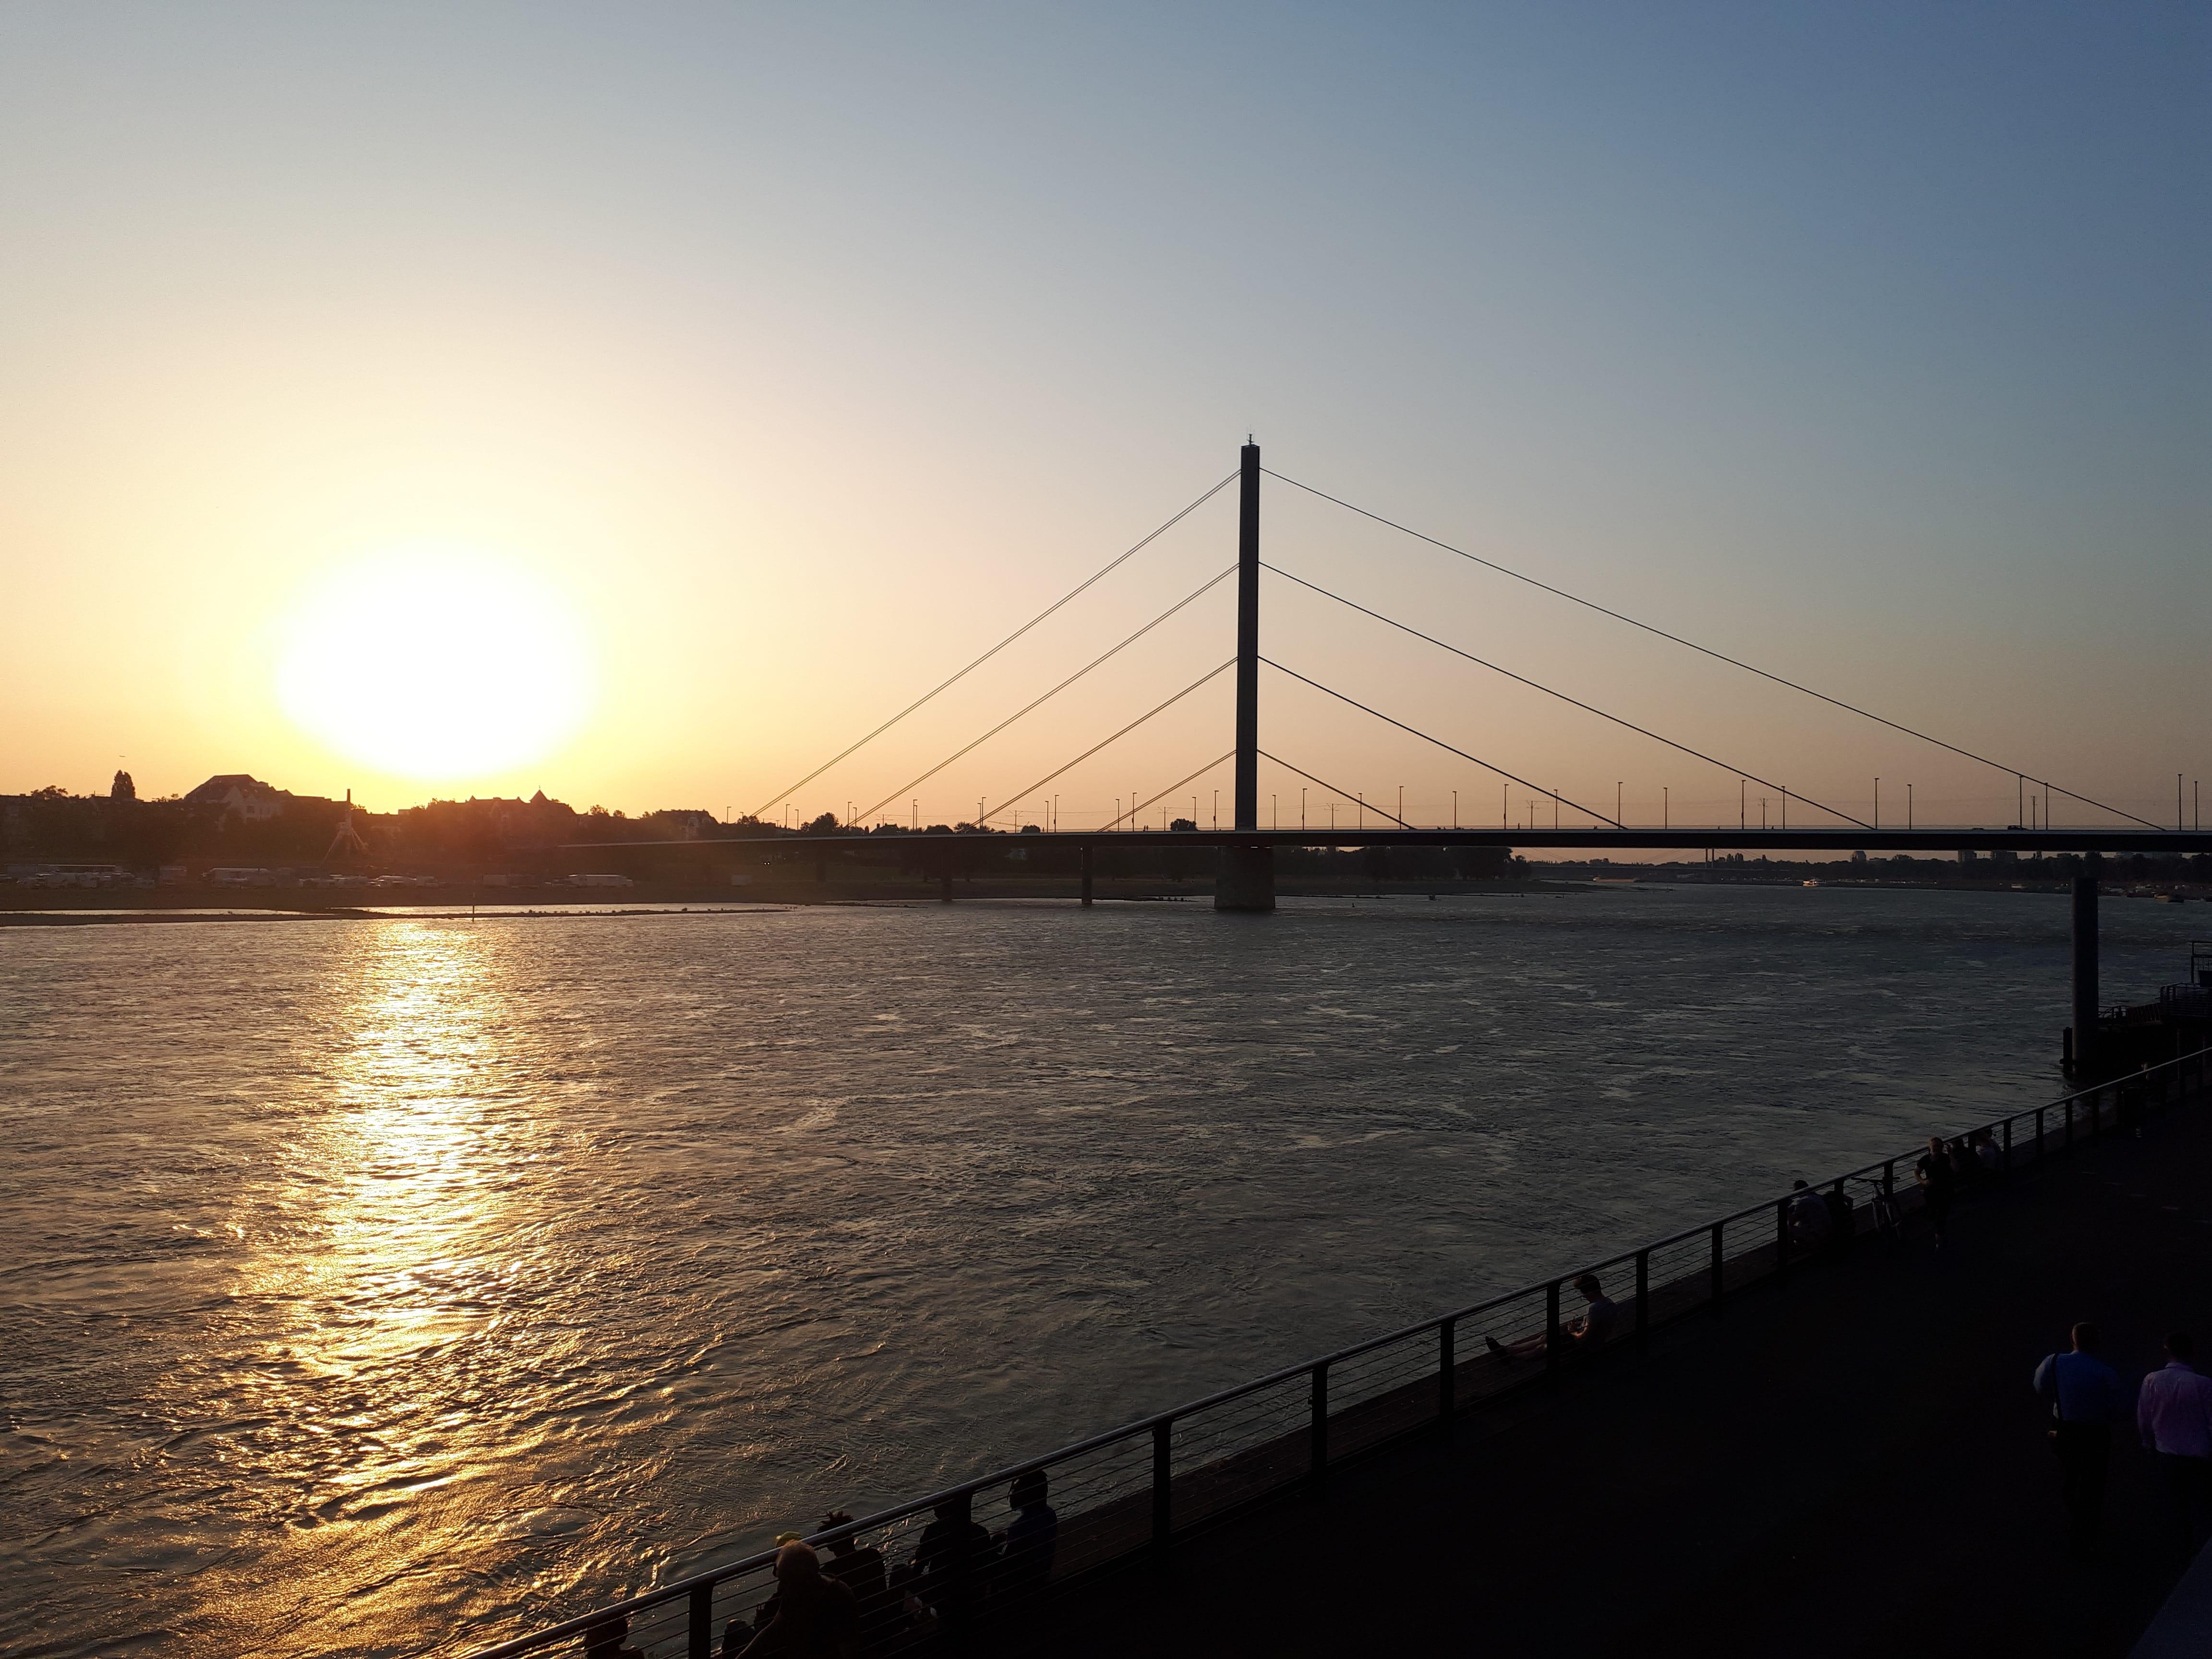 Exkursion to thyssenkrupp Steel Europe AG Duisburg & METEC Düsseldorf 3